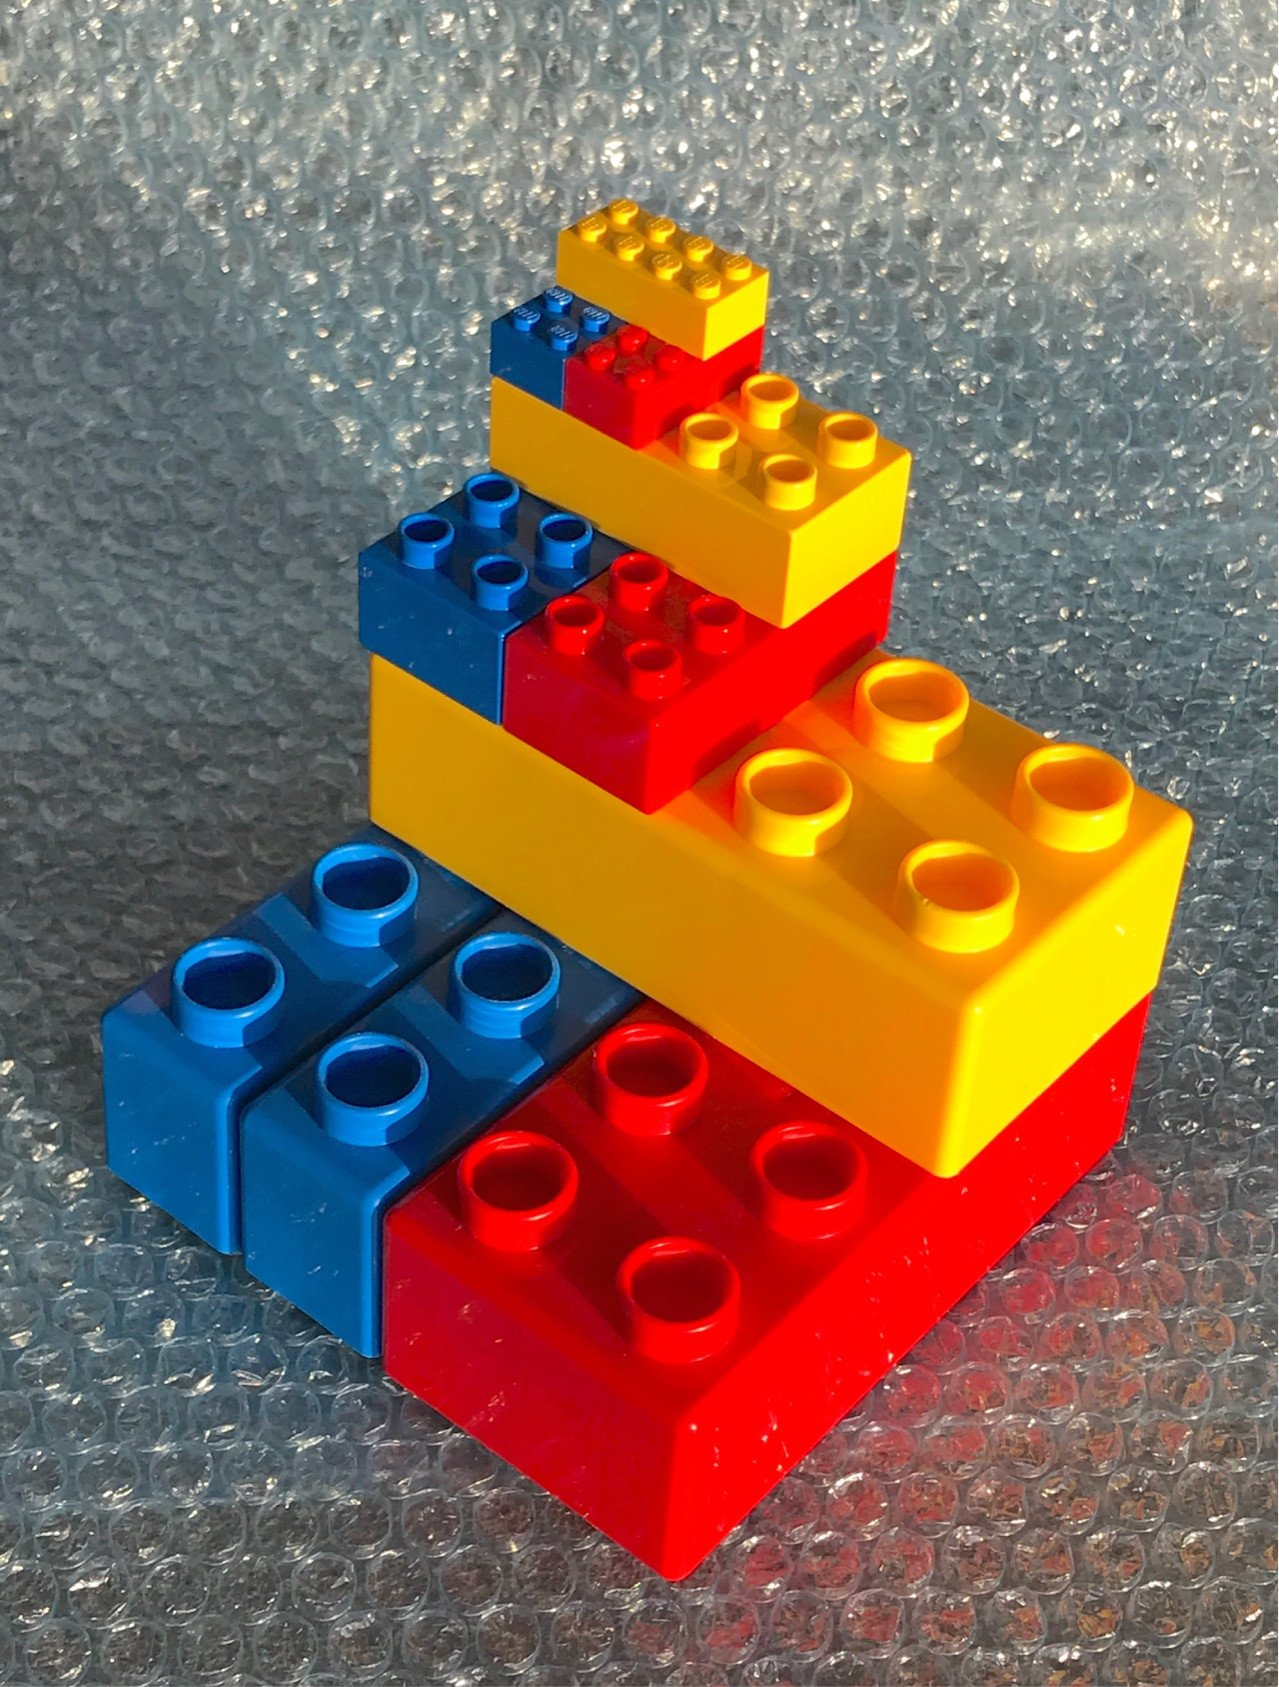 system, Duplo and Quatro bricks stacked